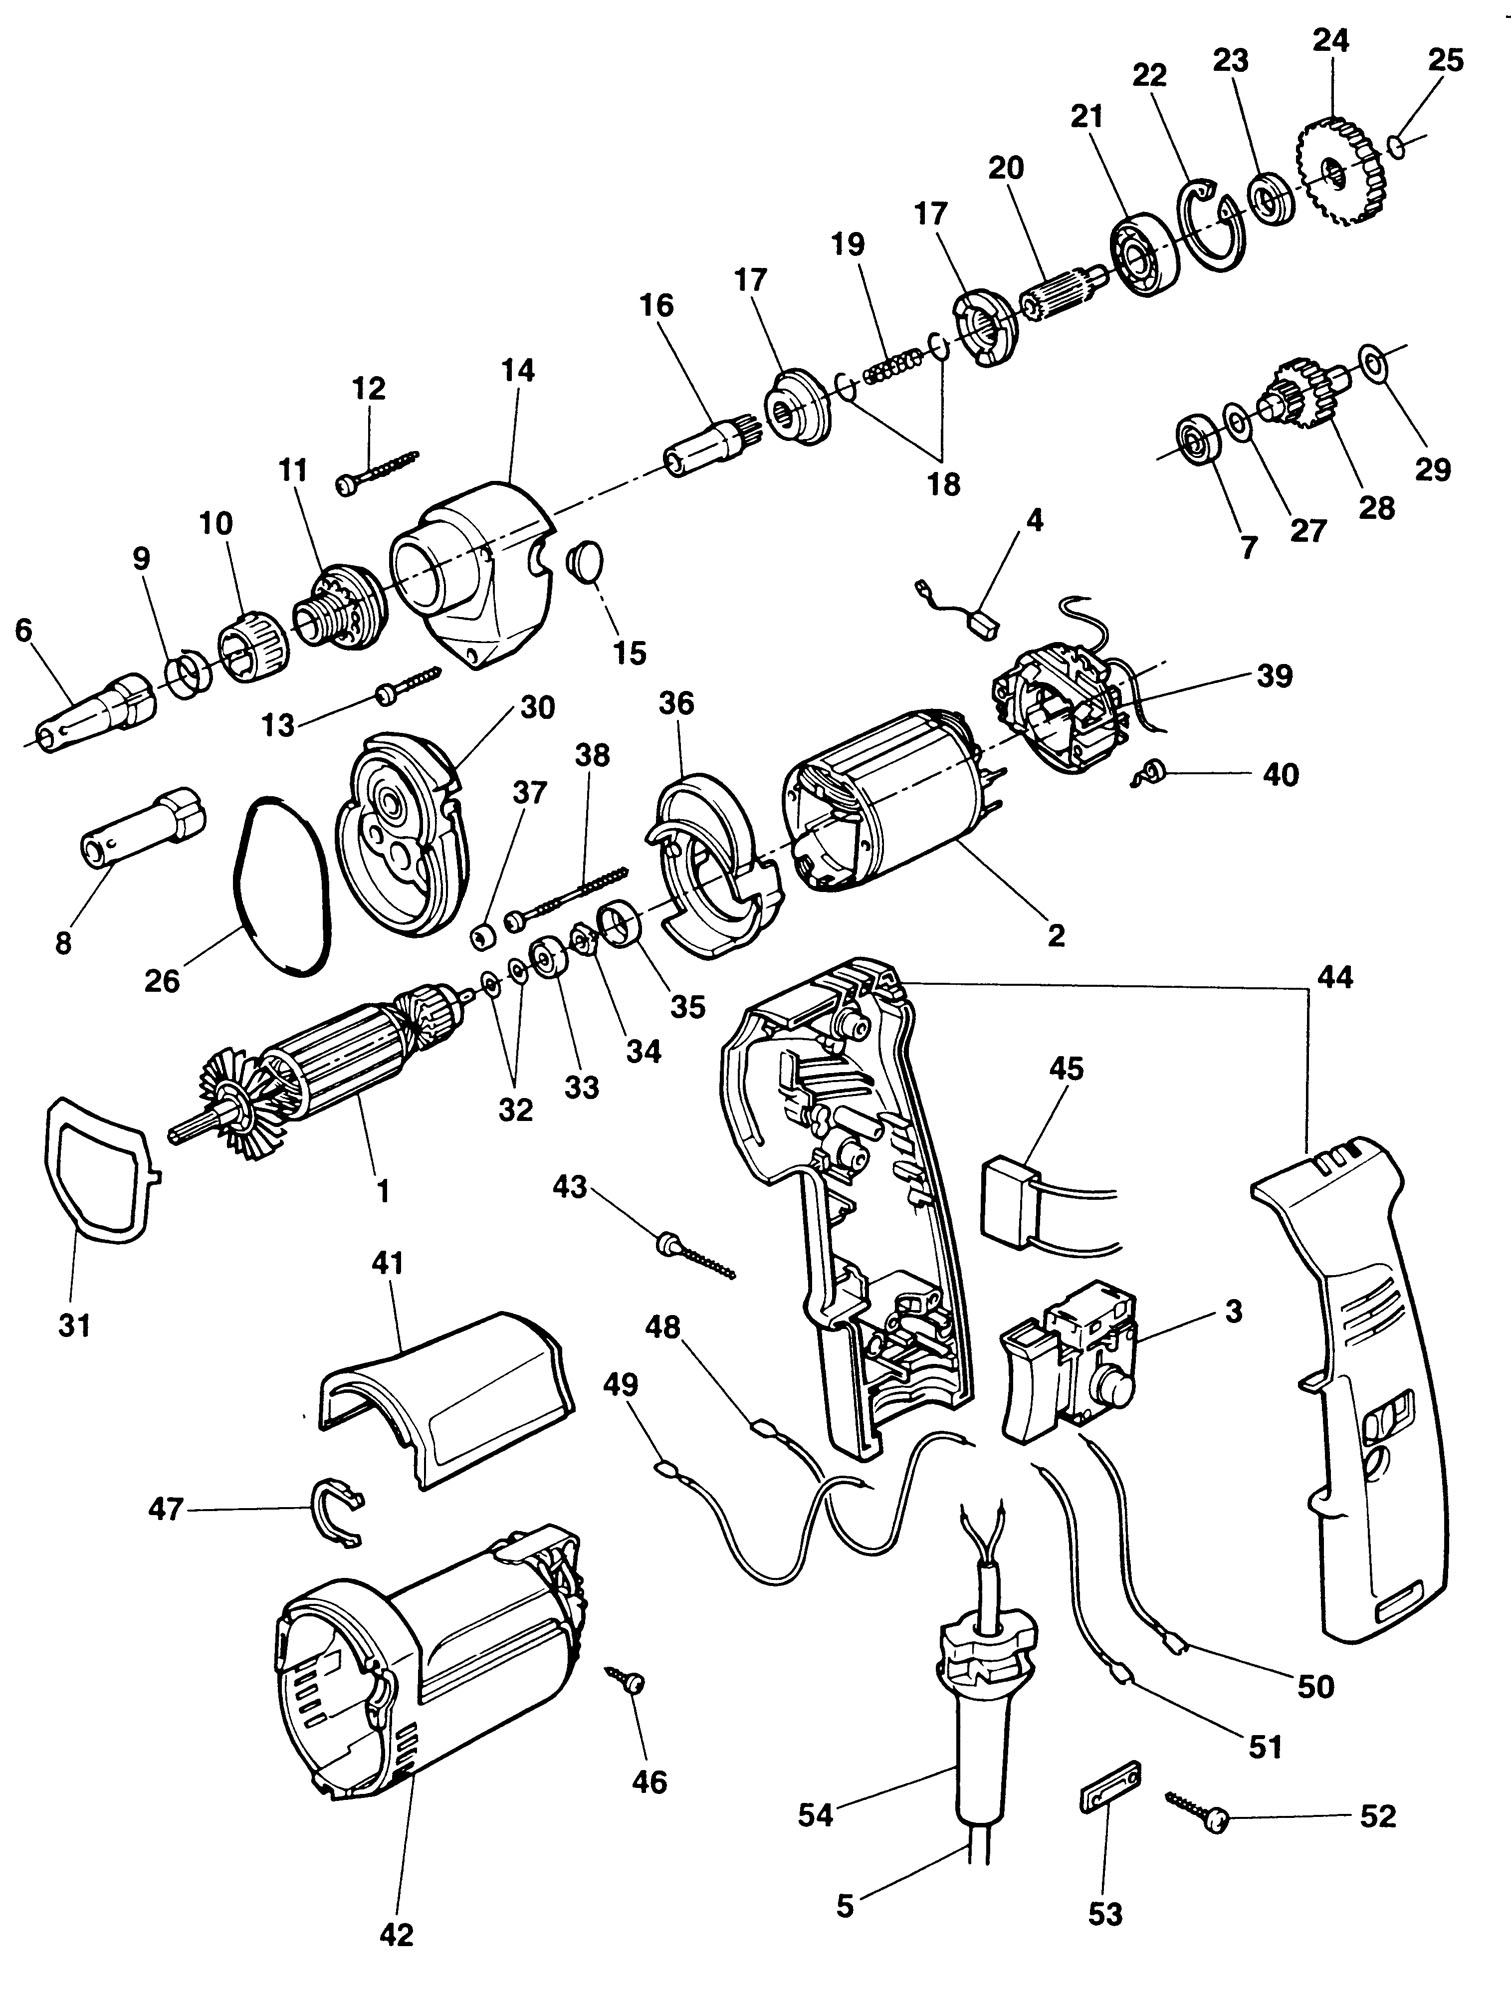 Spares For Elu Esd707 Screwdriver Type 2 Spare Esd707